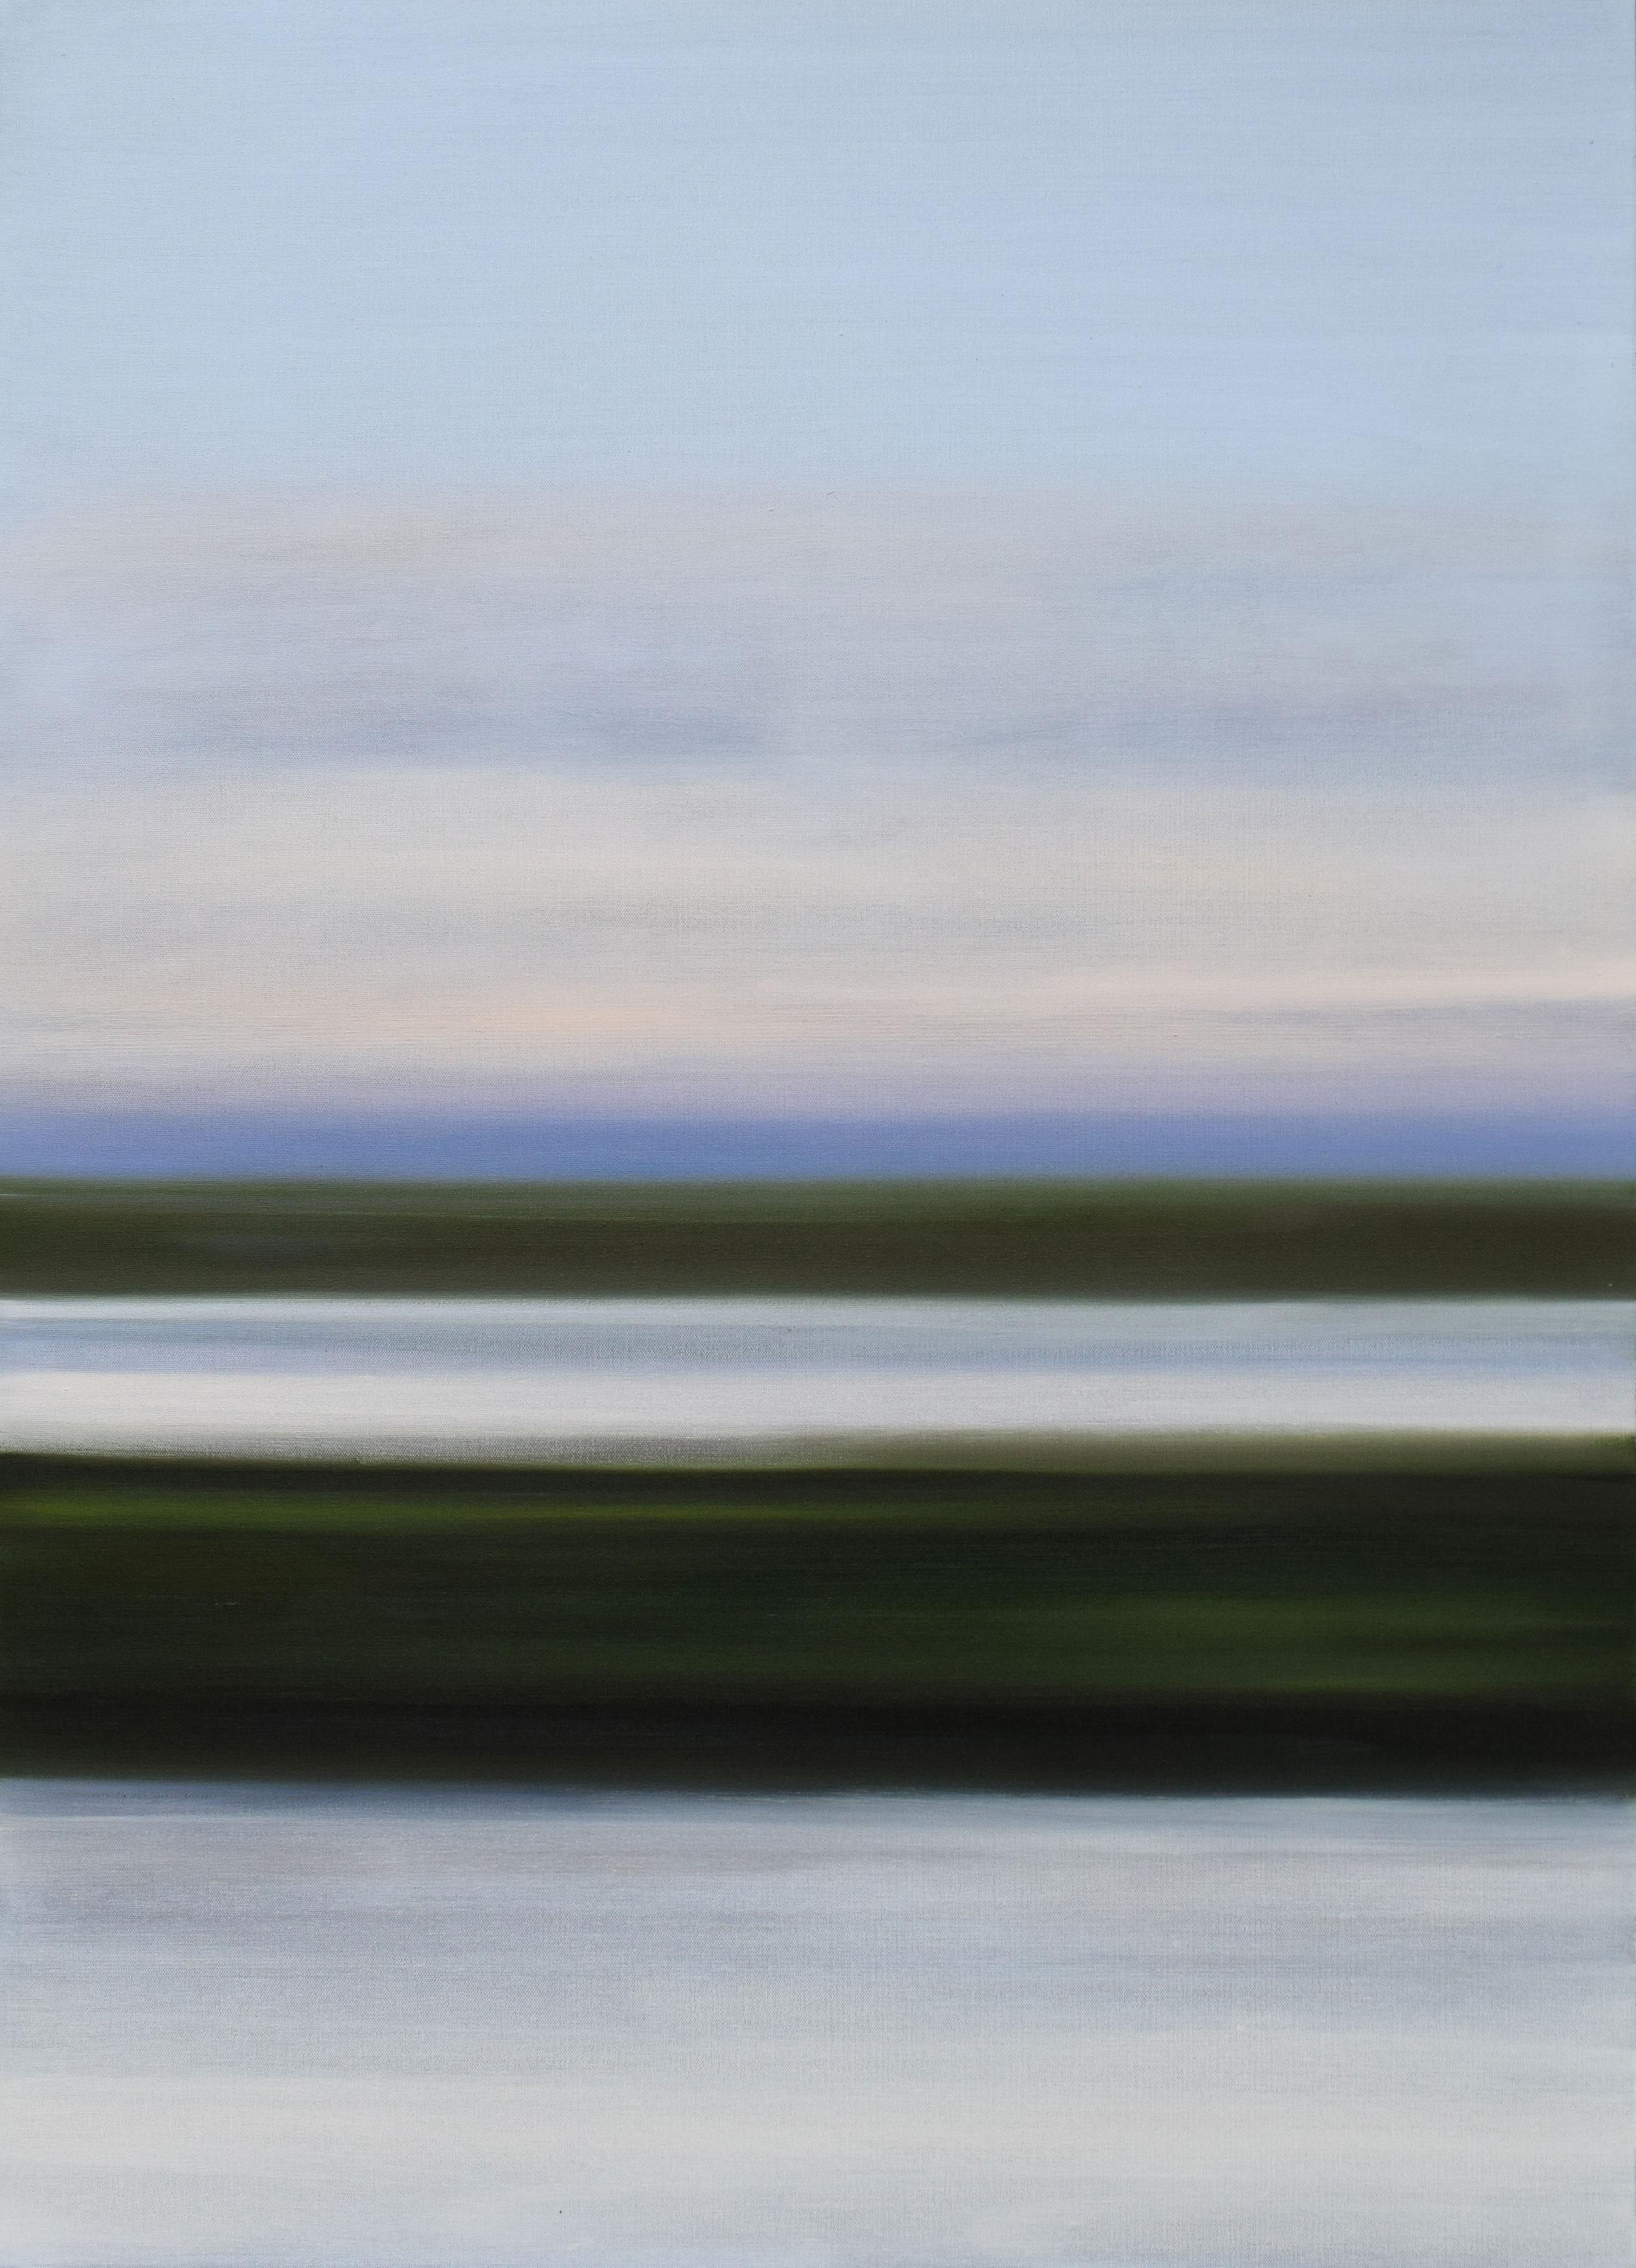 Essex Marshes Horizon III